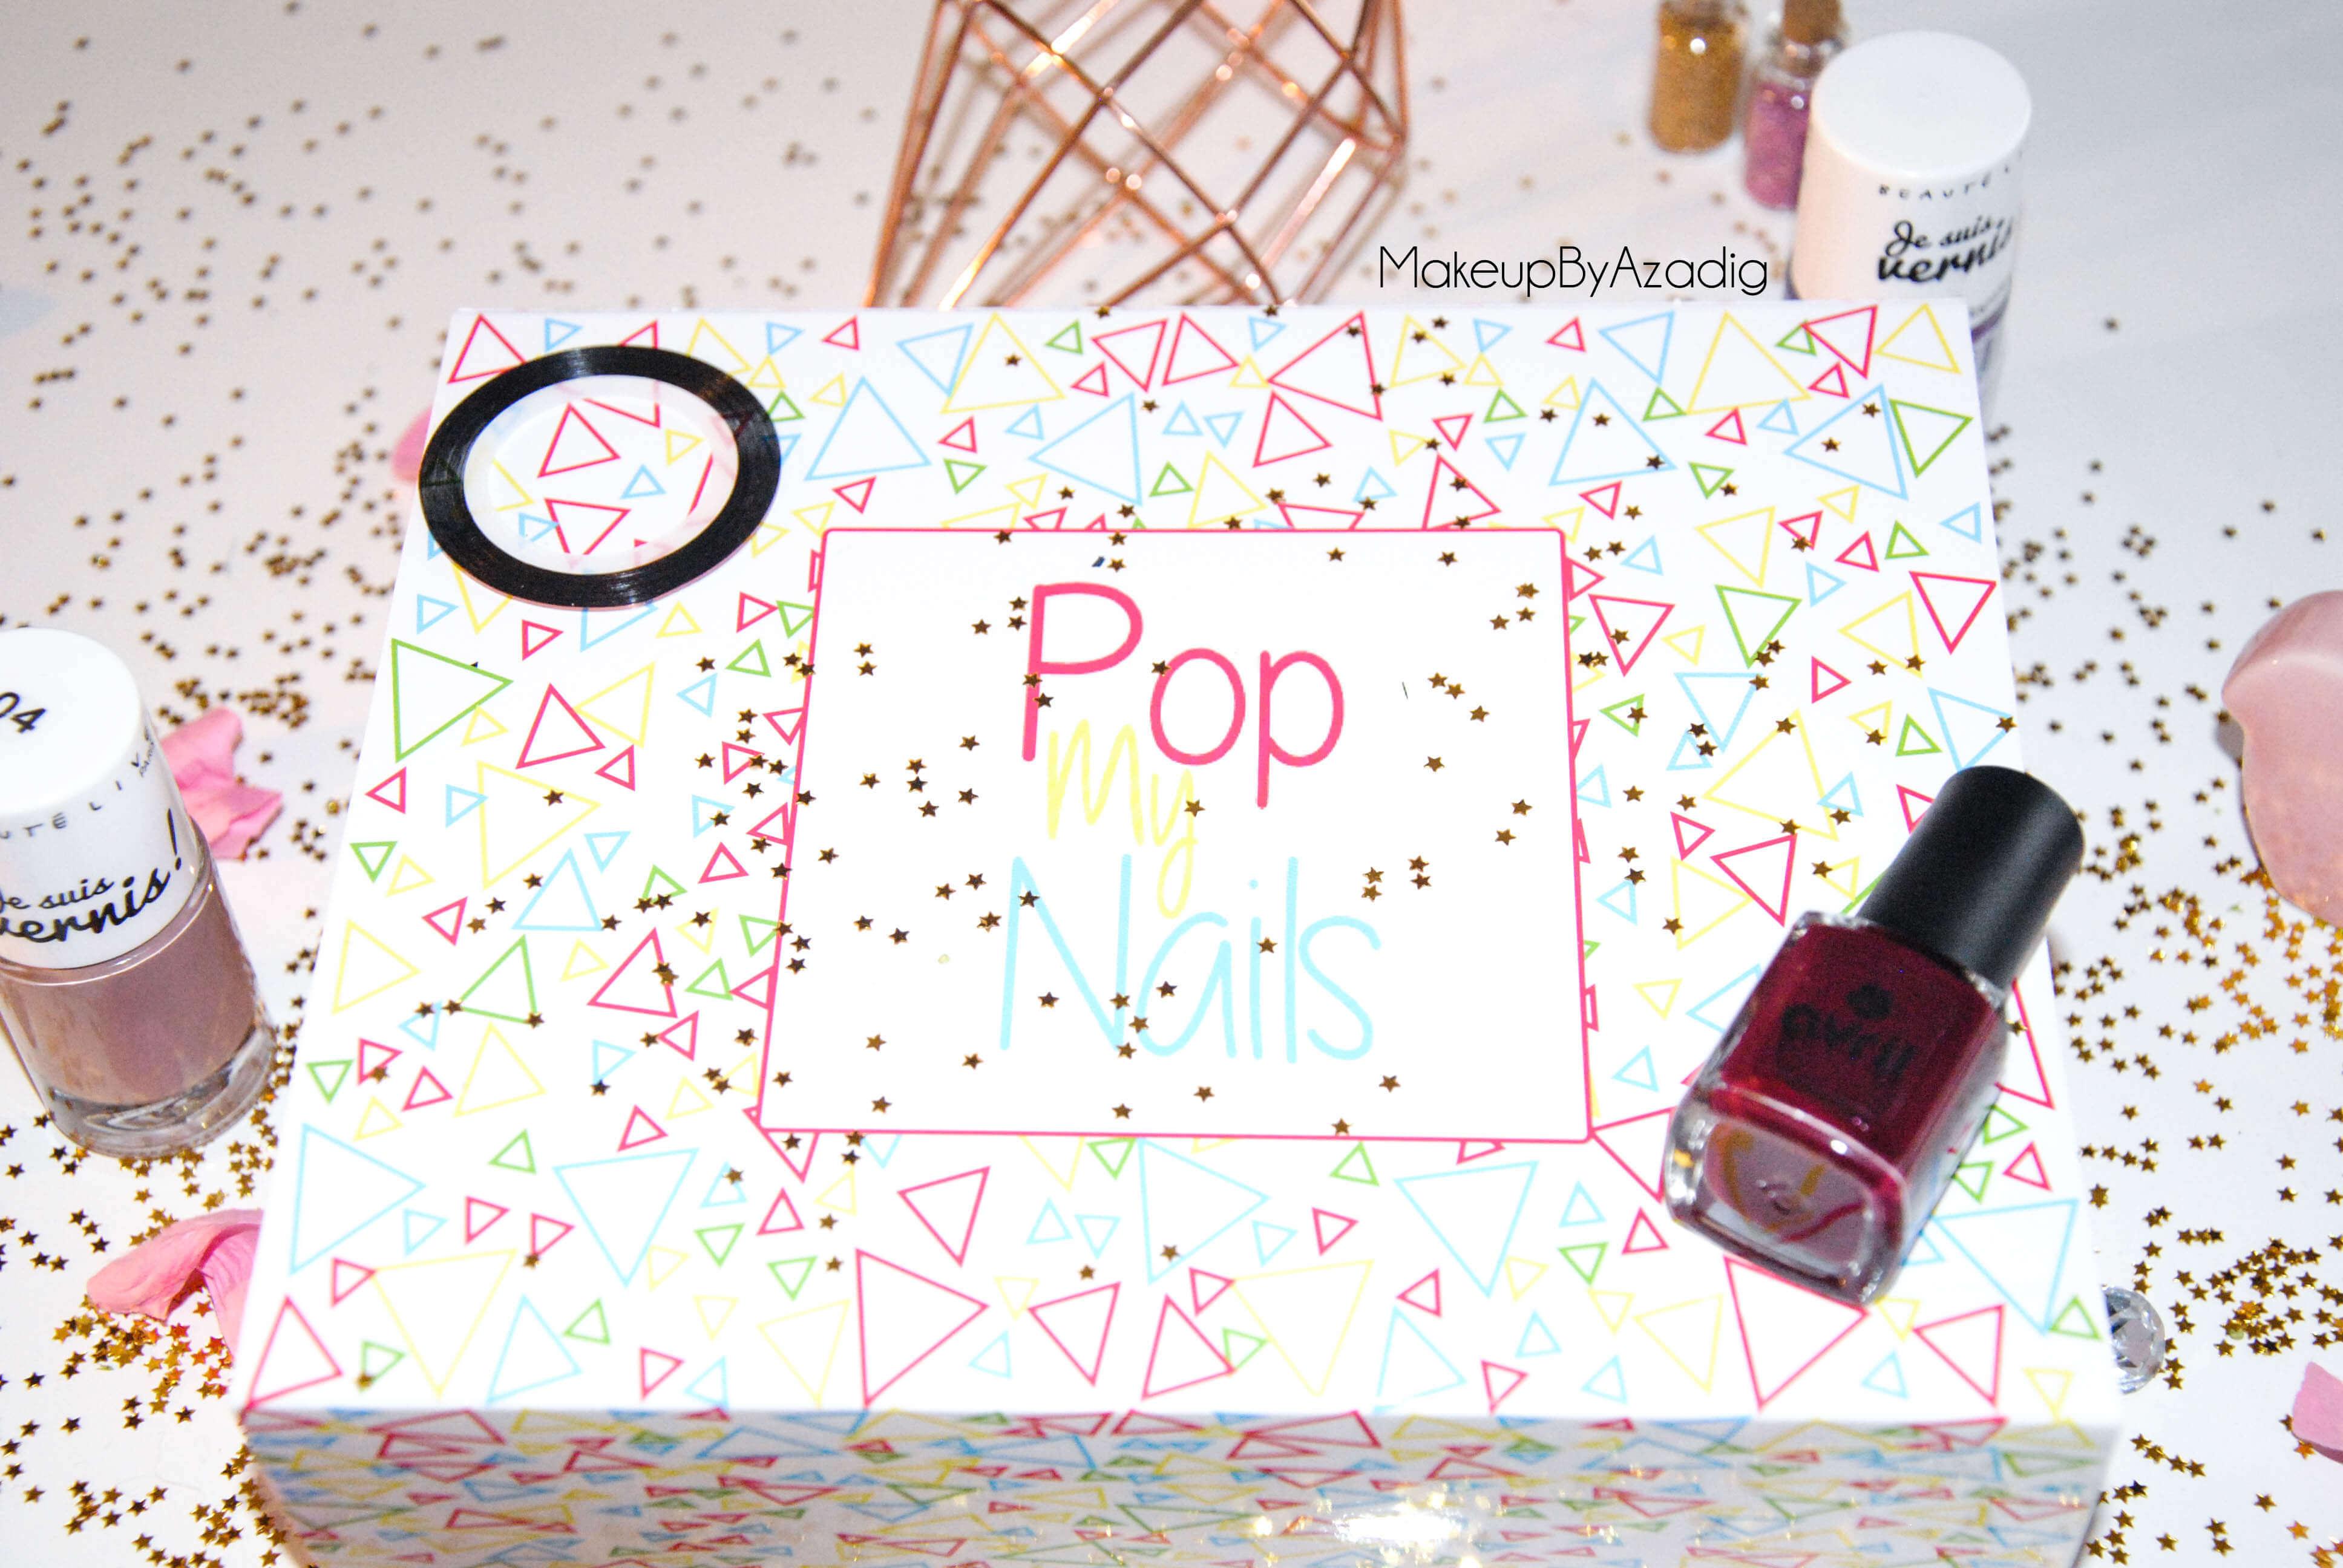 popmynails-makeupbyazadig-box-beaute-vernis-nails-troyes-paris-revue-avis-prix-blogger